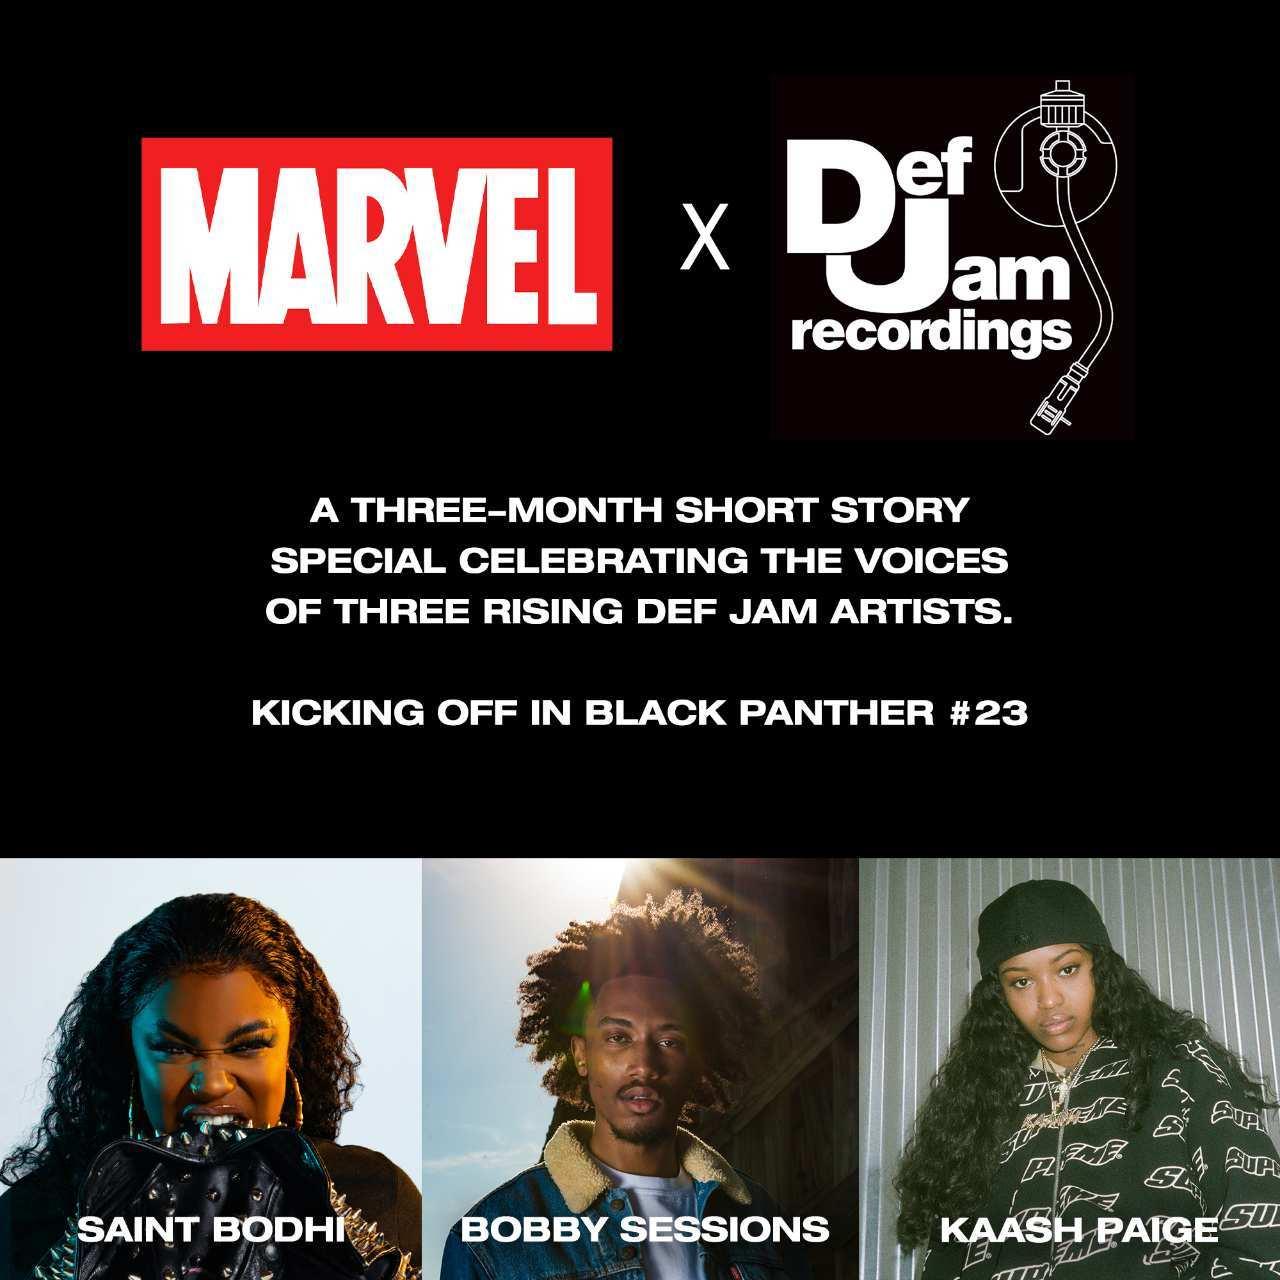 Marvel x Def Jam